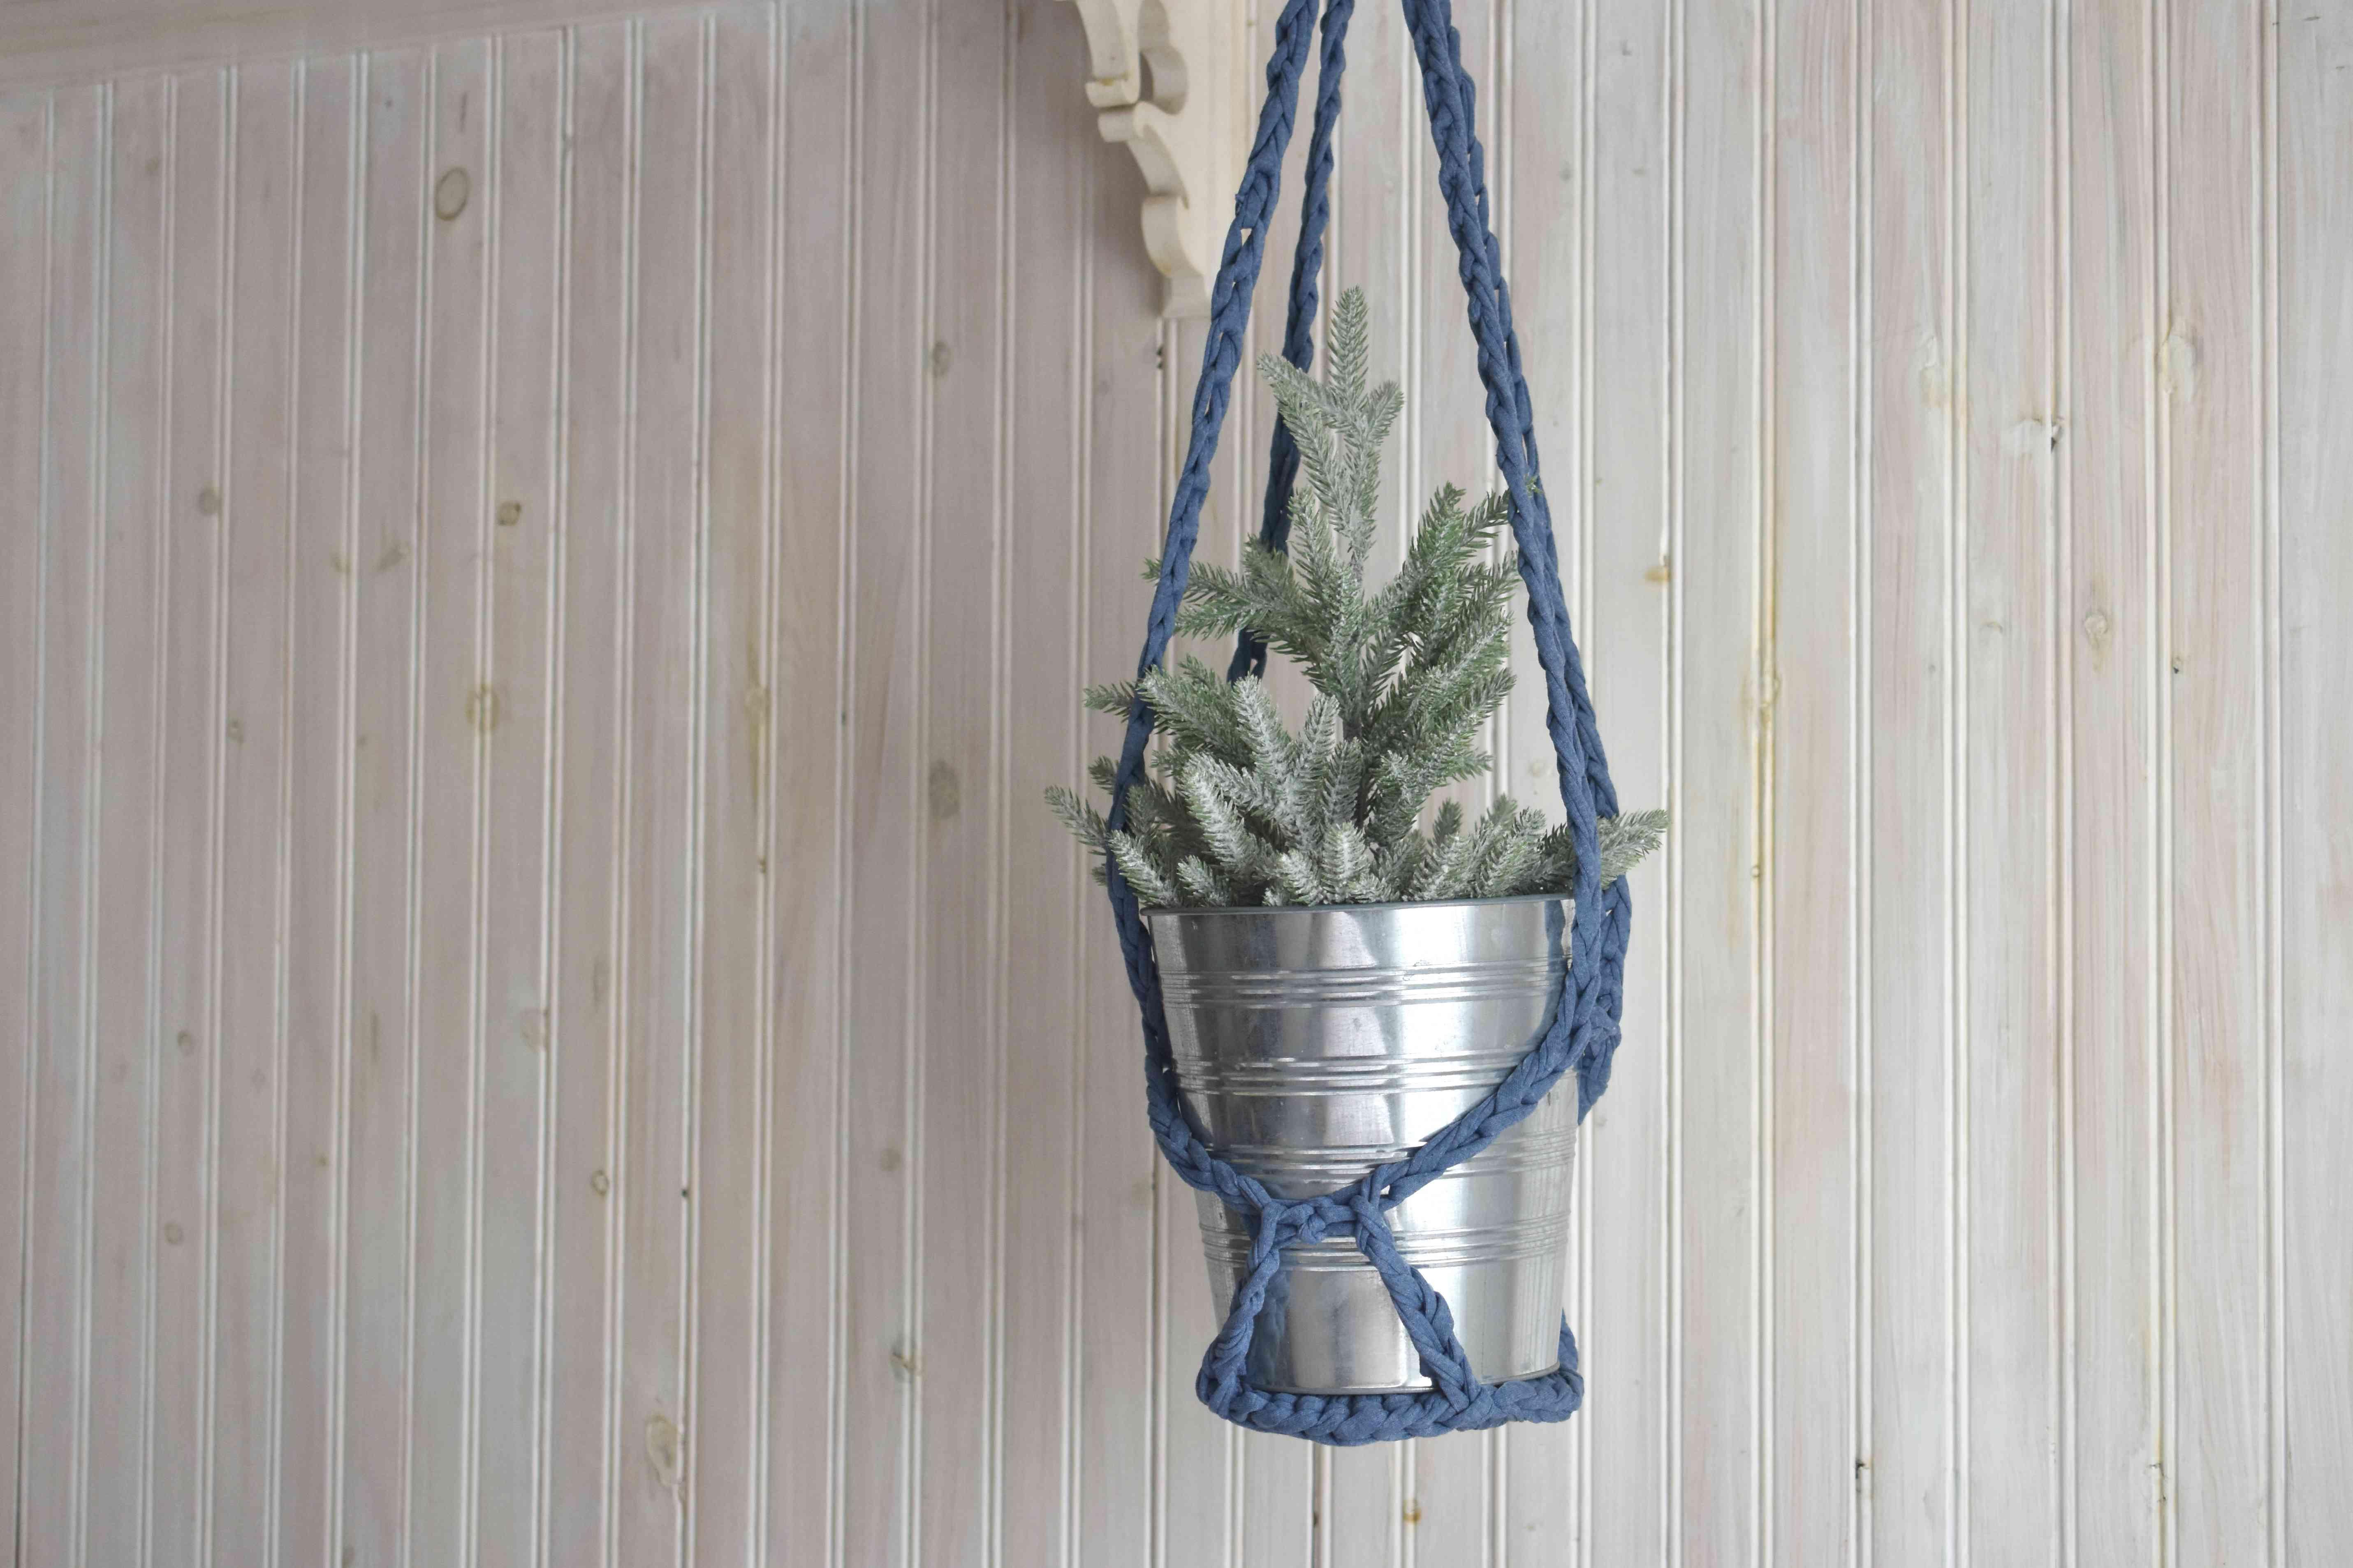 How to Make a DIY Crochet Plant Hanger